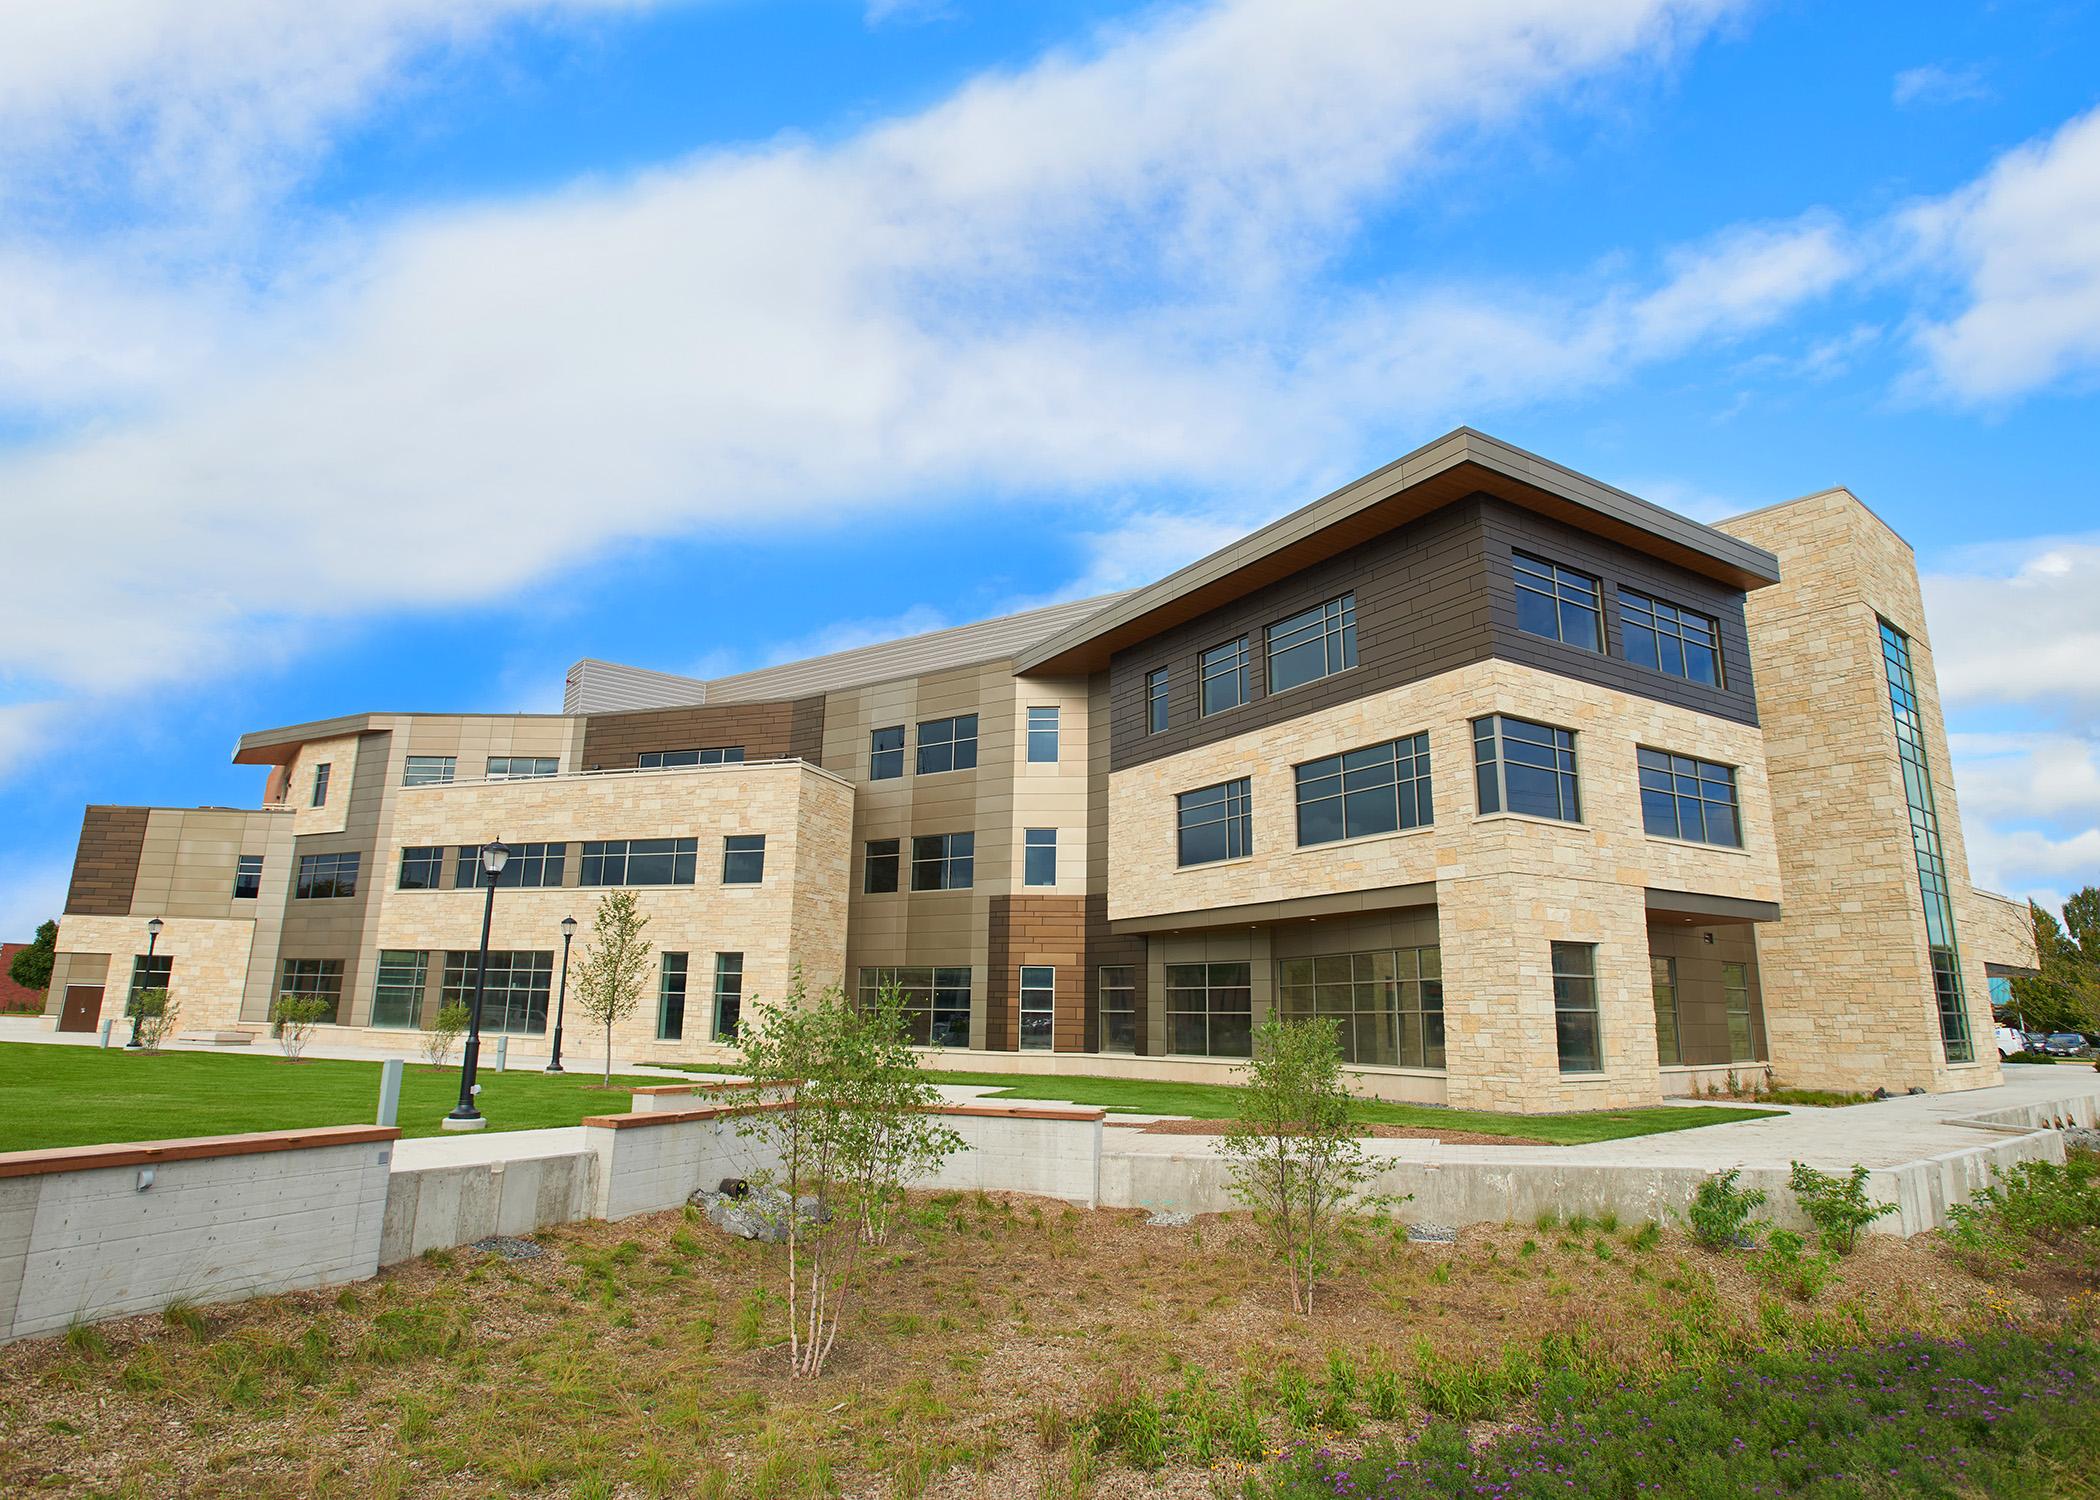 Building in the University of Wisconsin - La Crosse campus